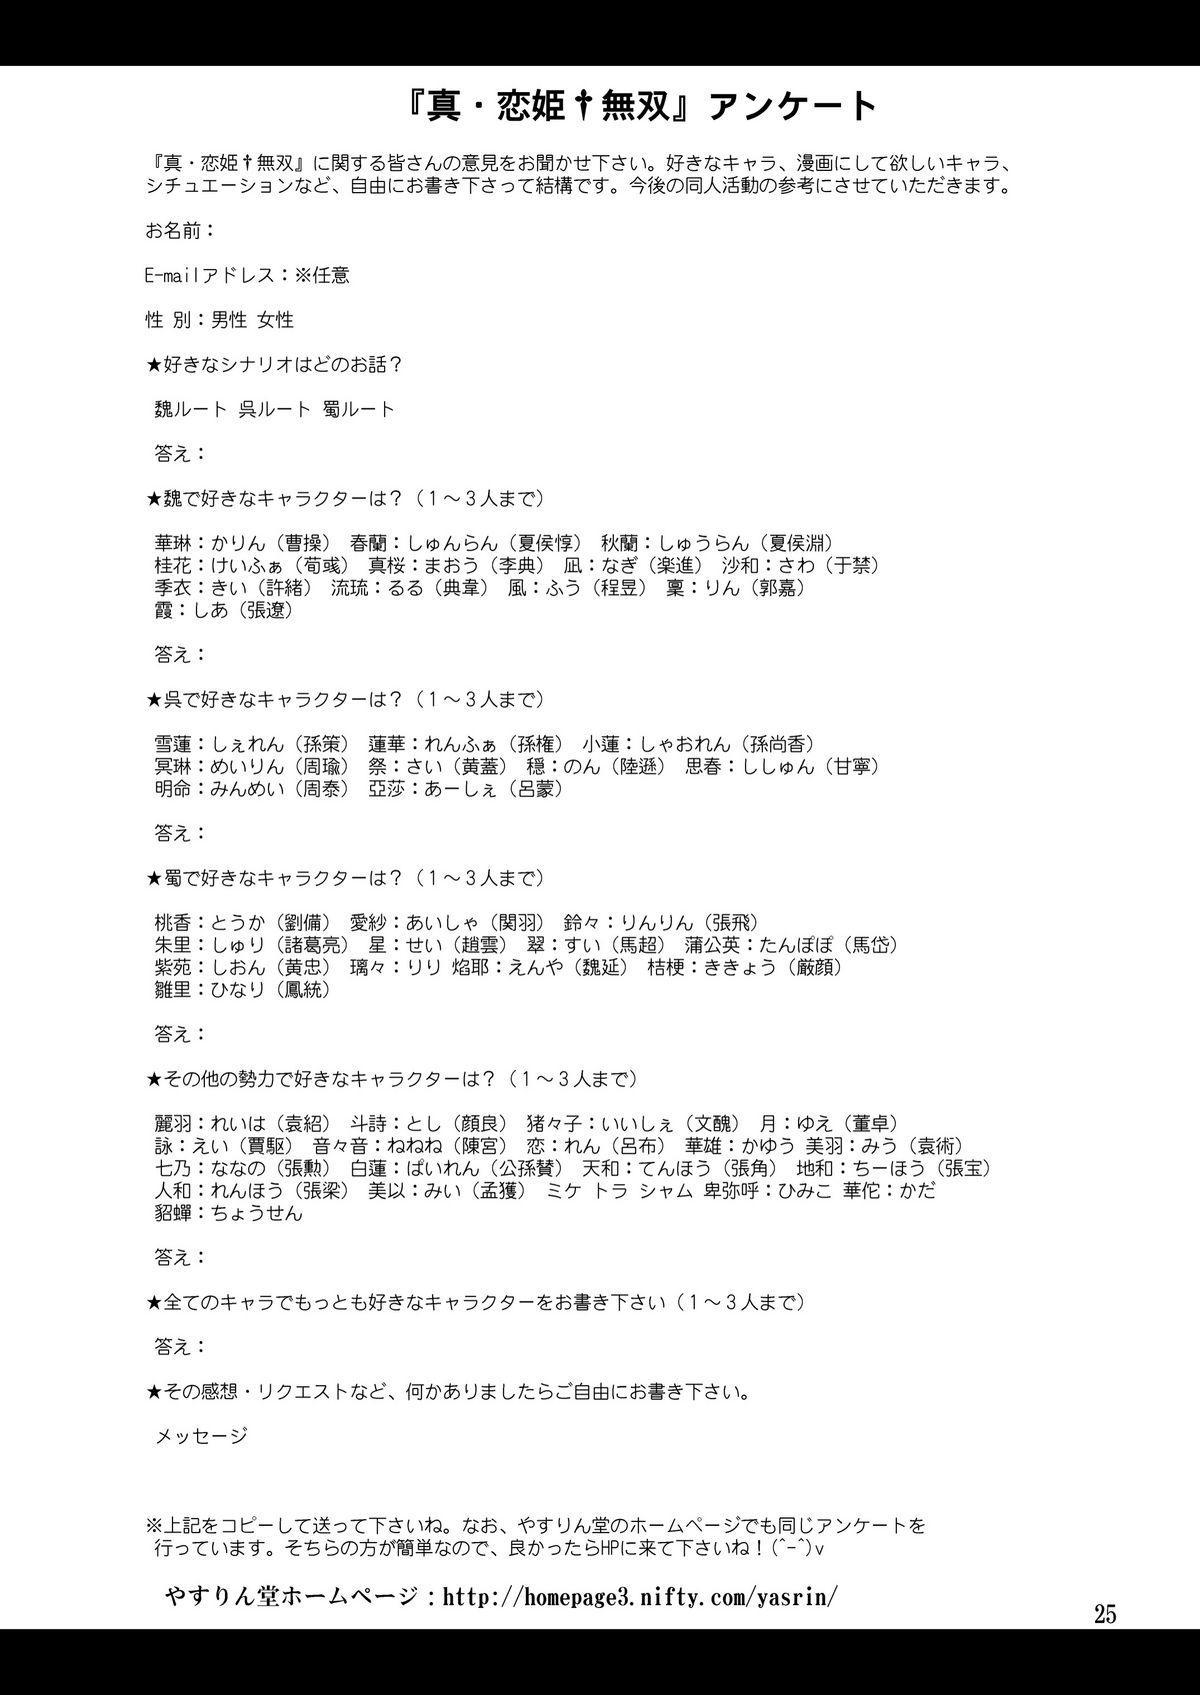 Karin-sama Otsuujiteki Jijou 24